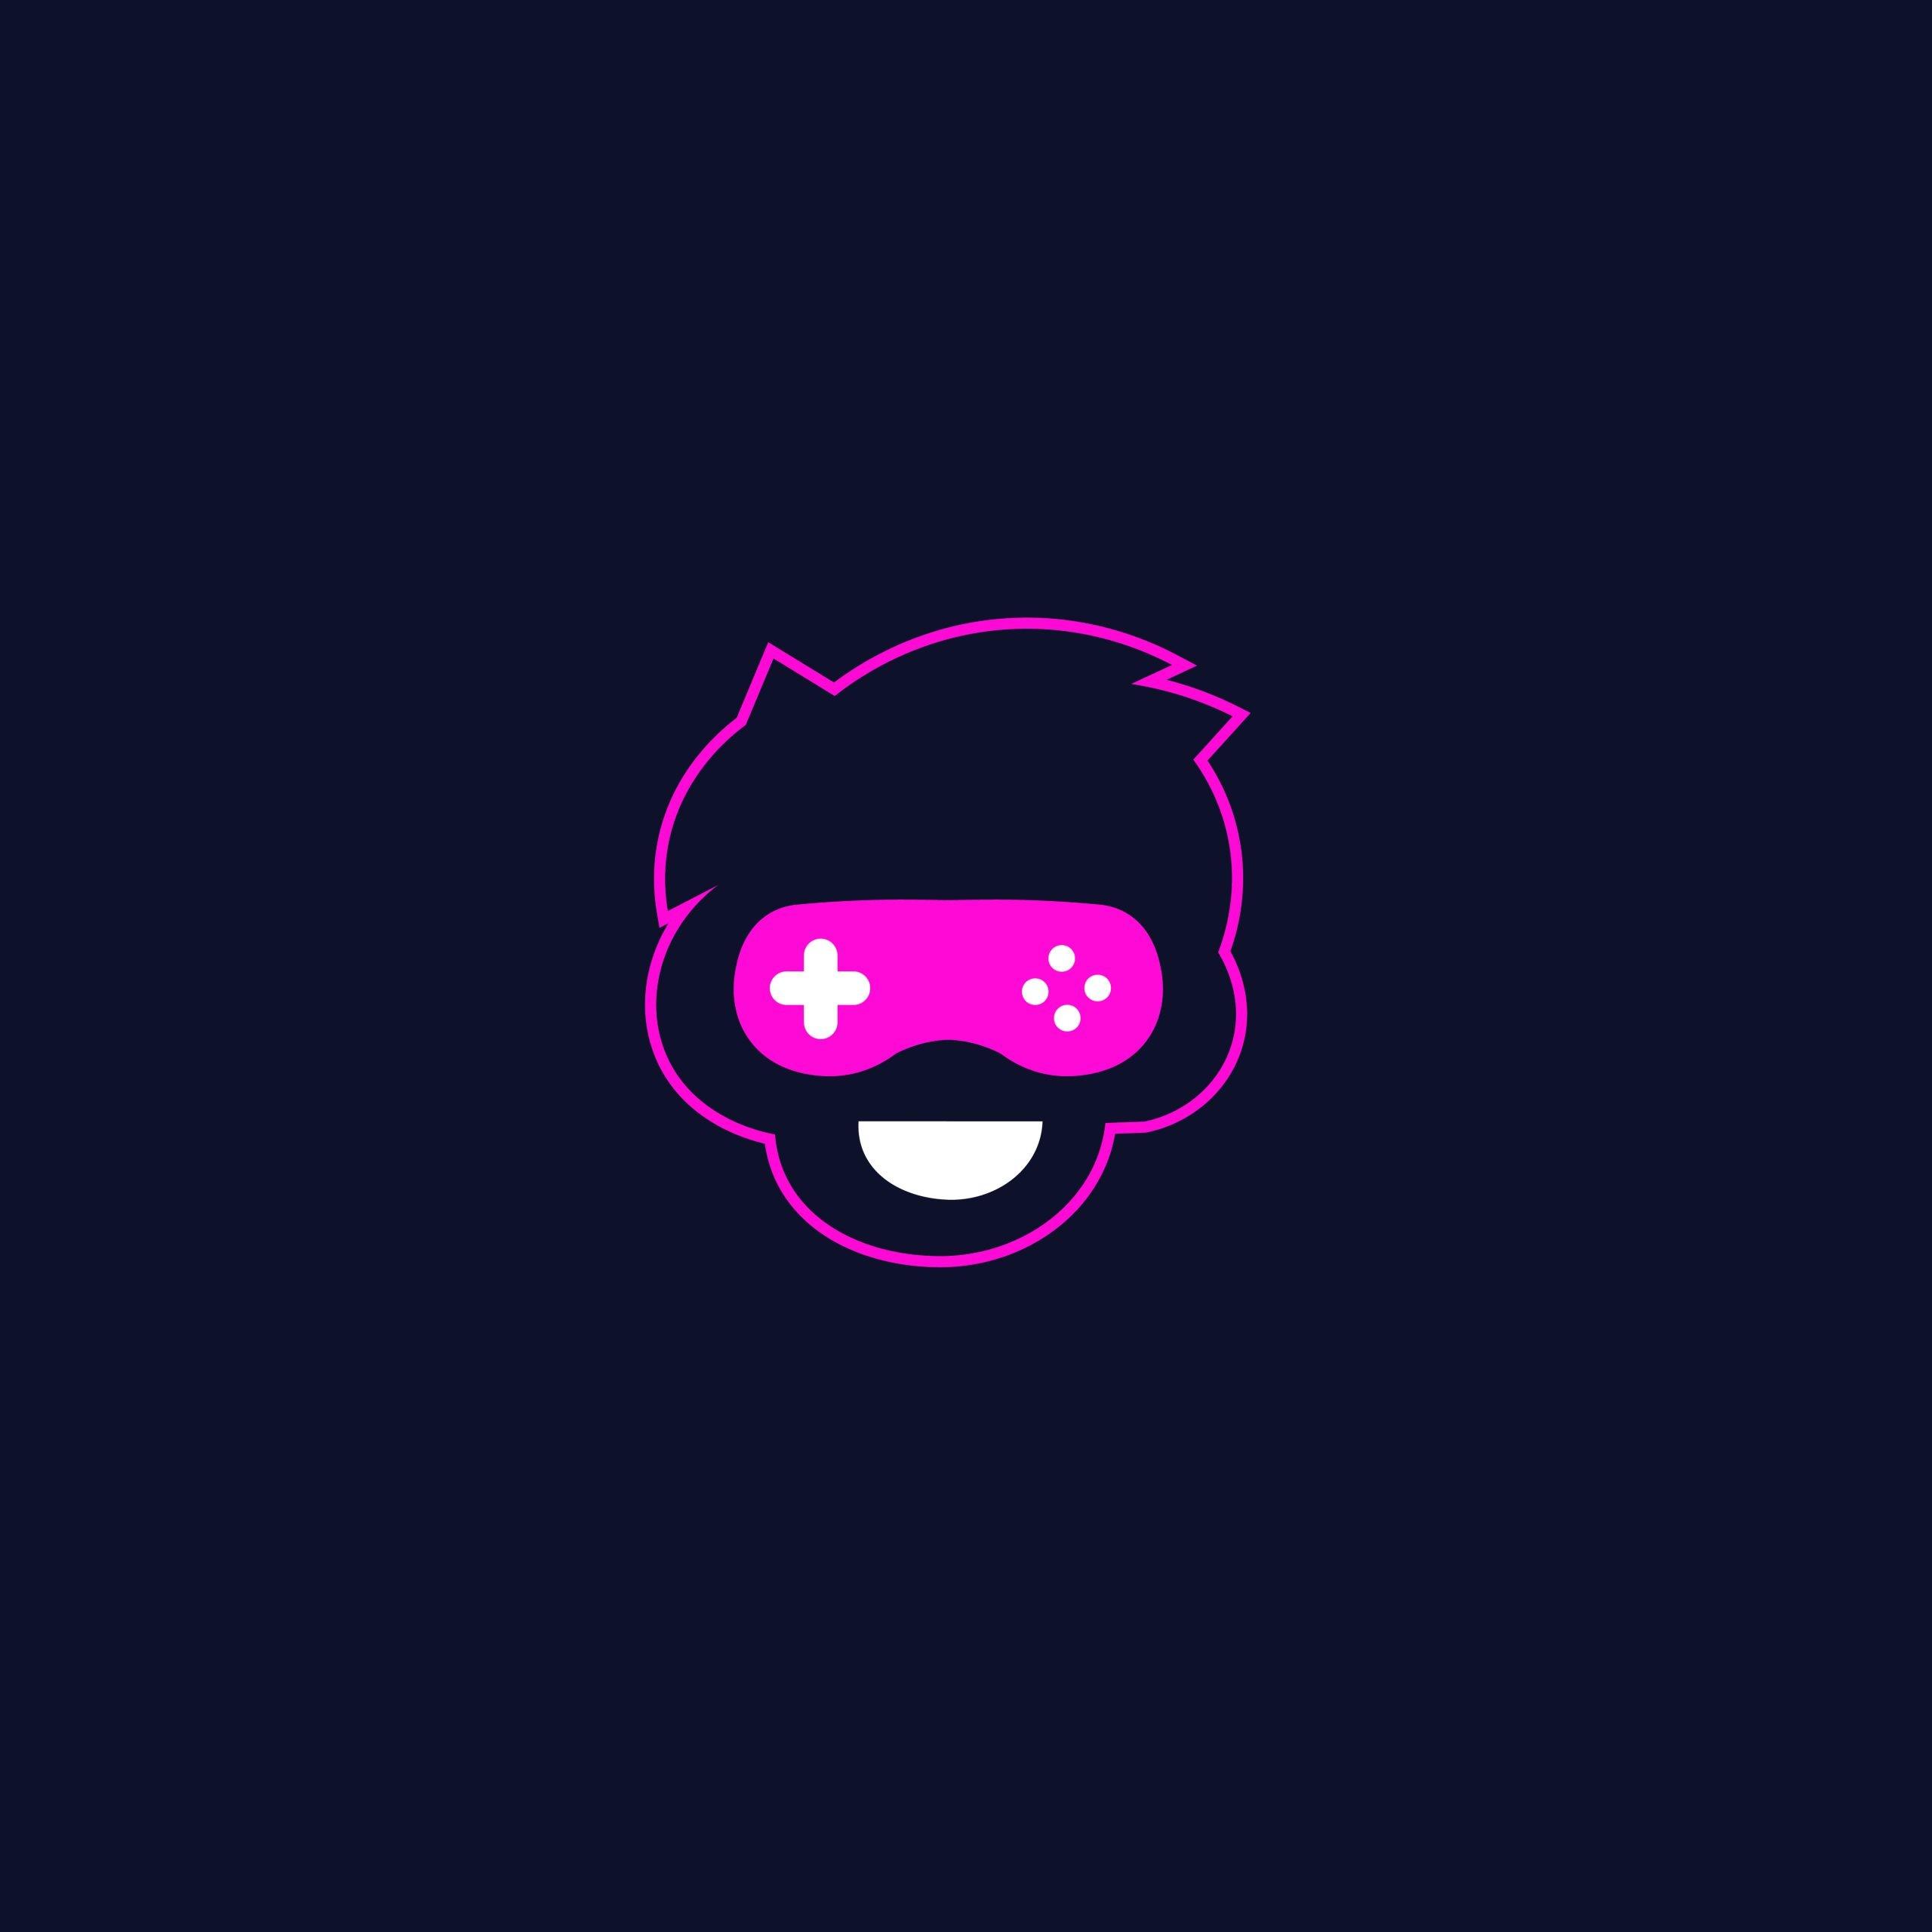 Gamer Boy Mascot Logo